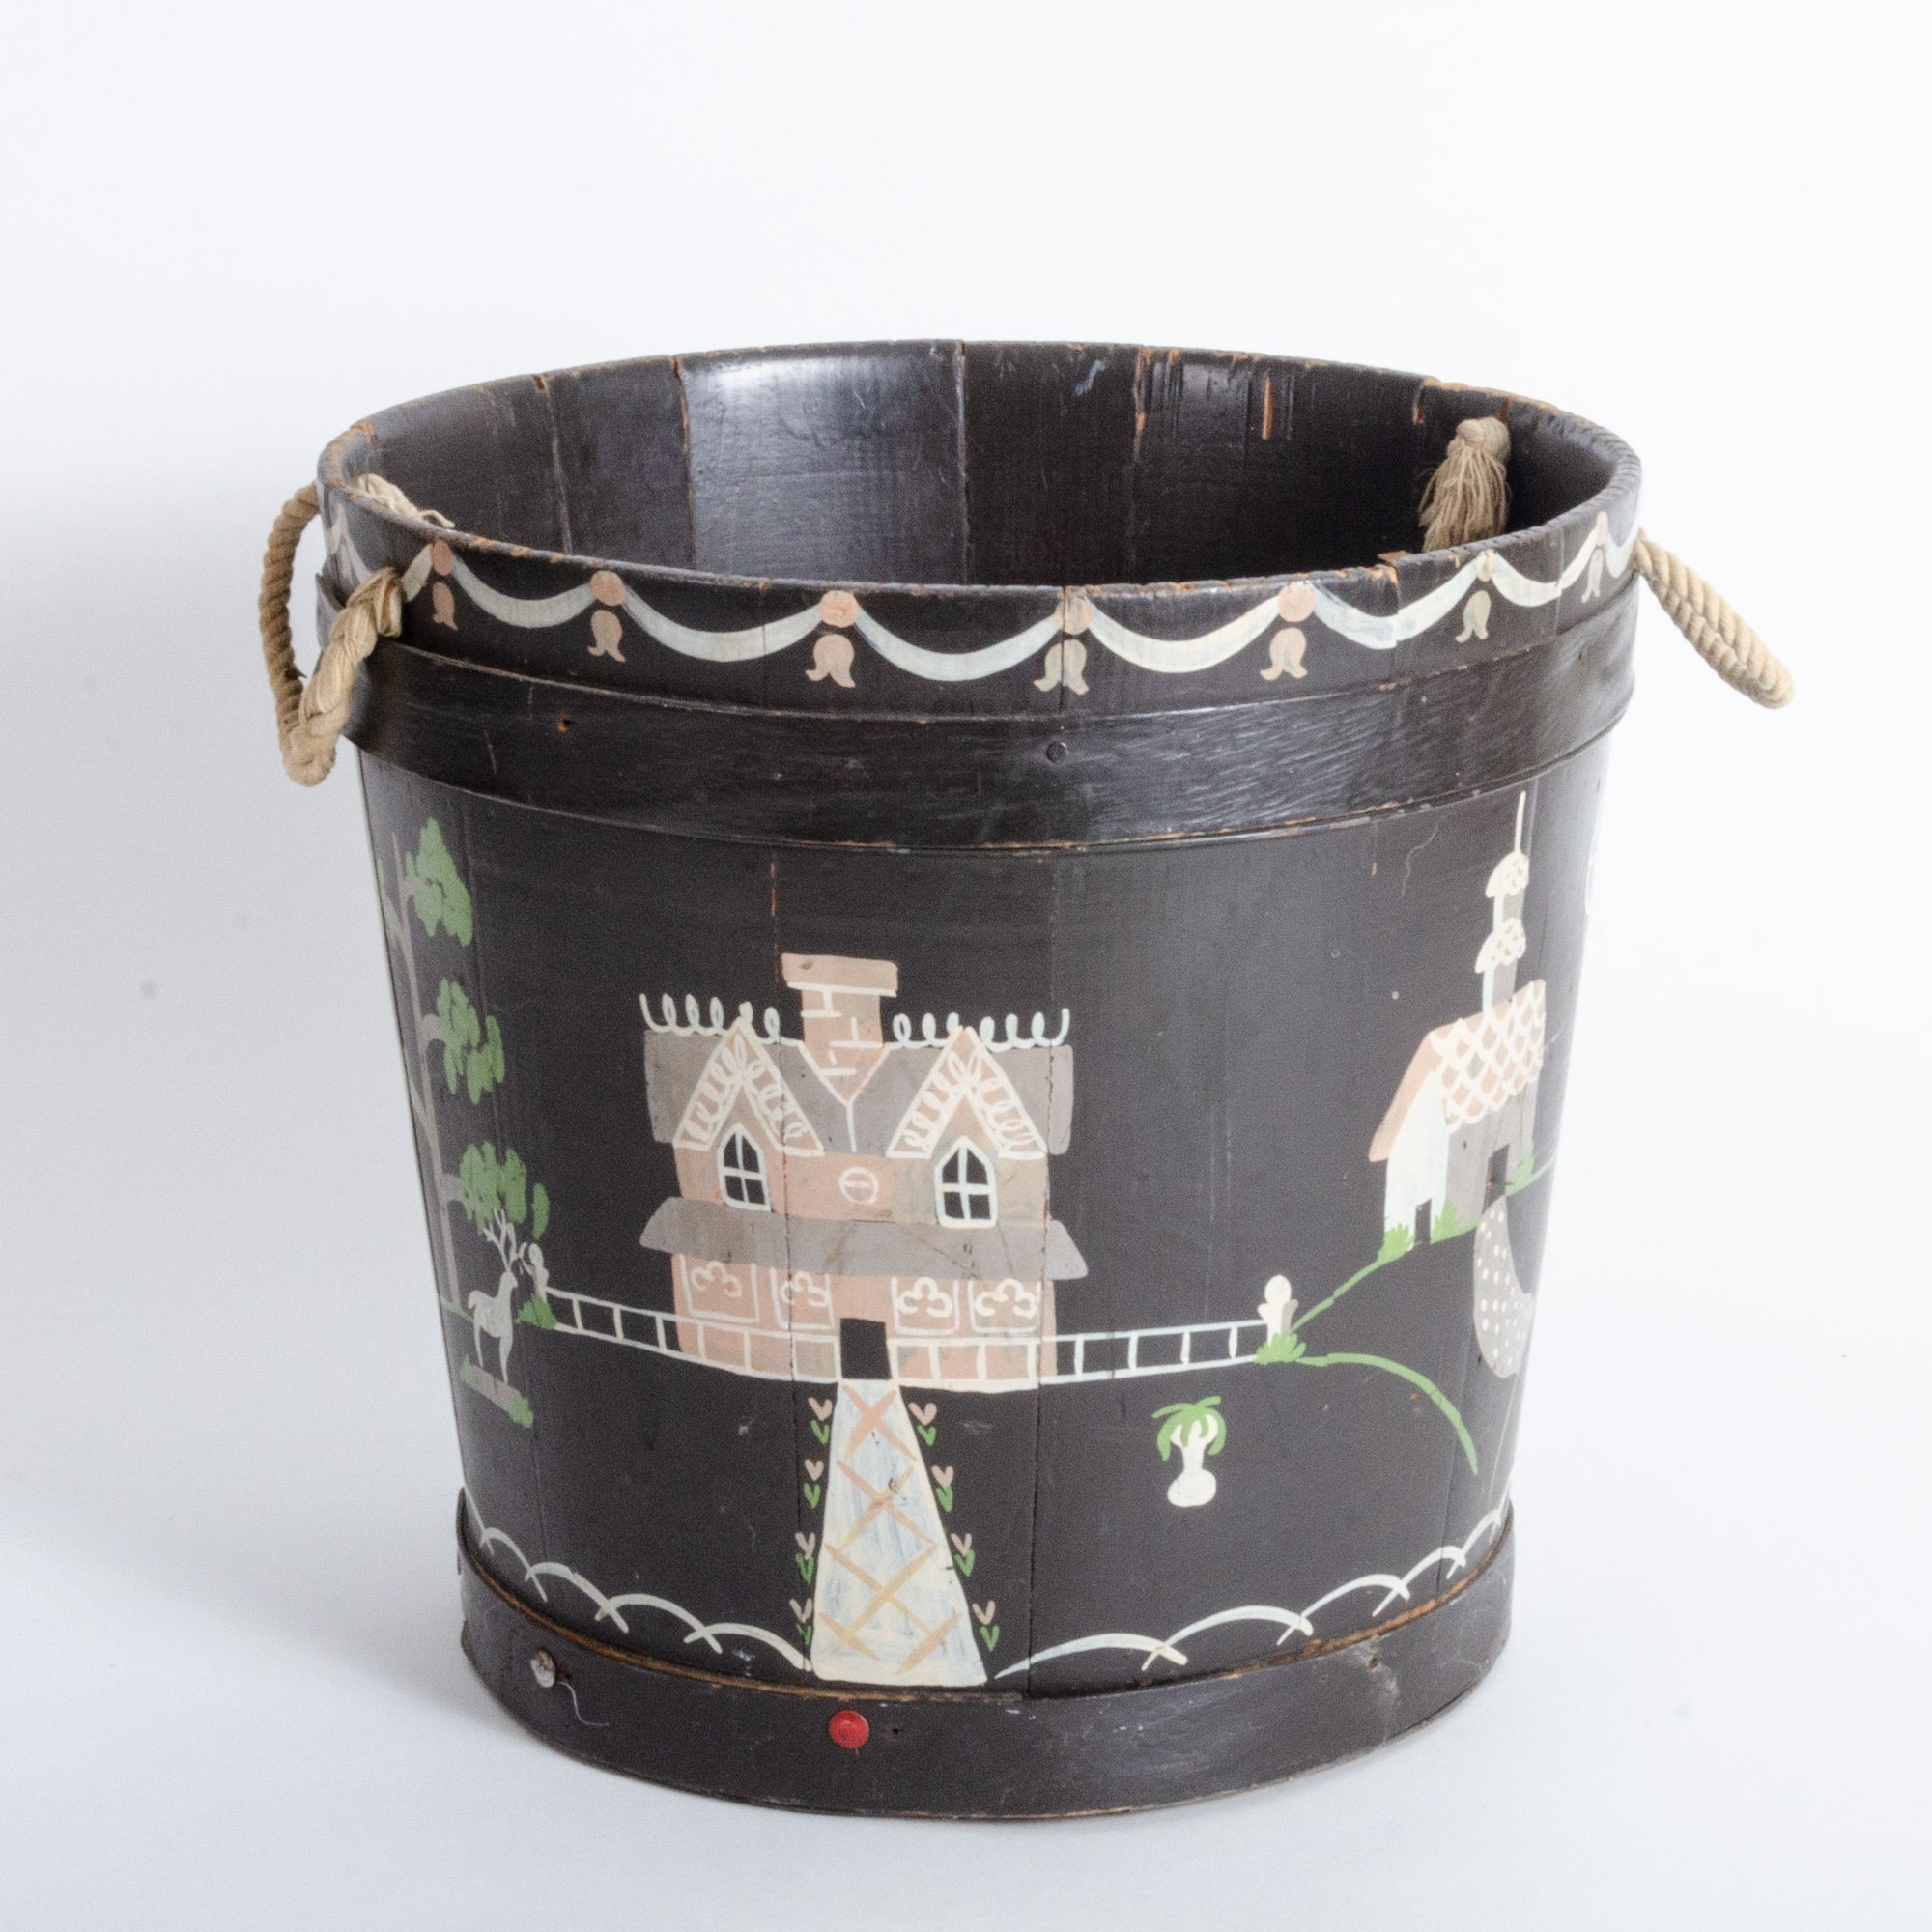 Helen Hume Stenciled Wooden Bucket